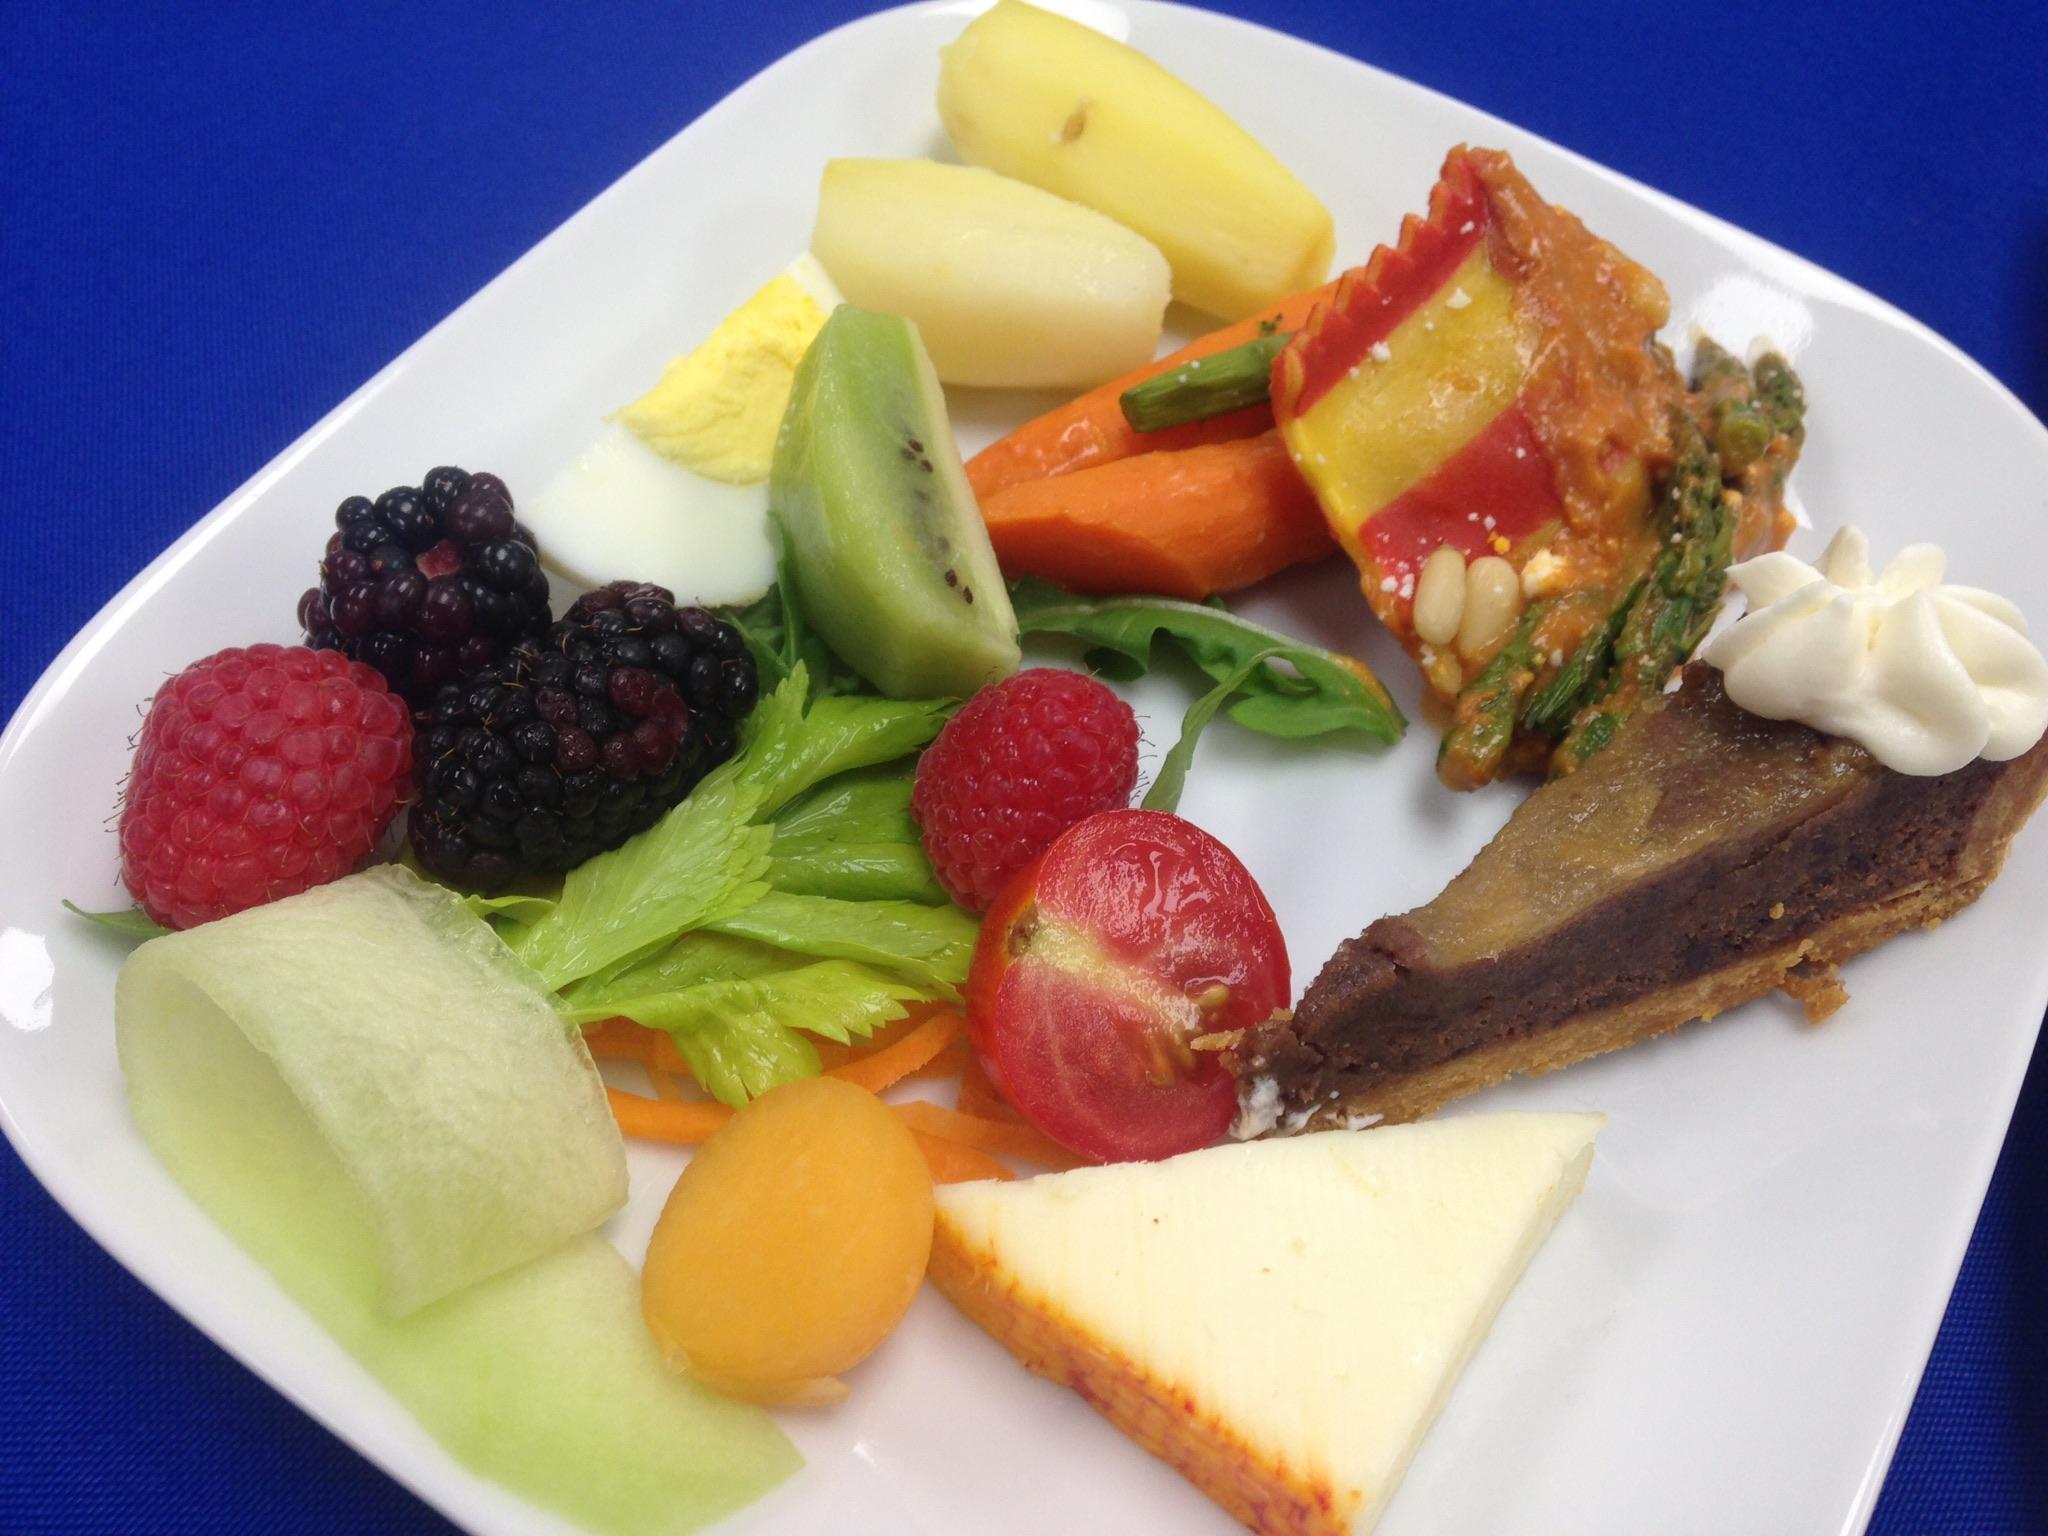 Tasting airline food